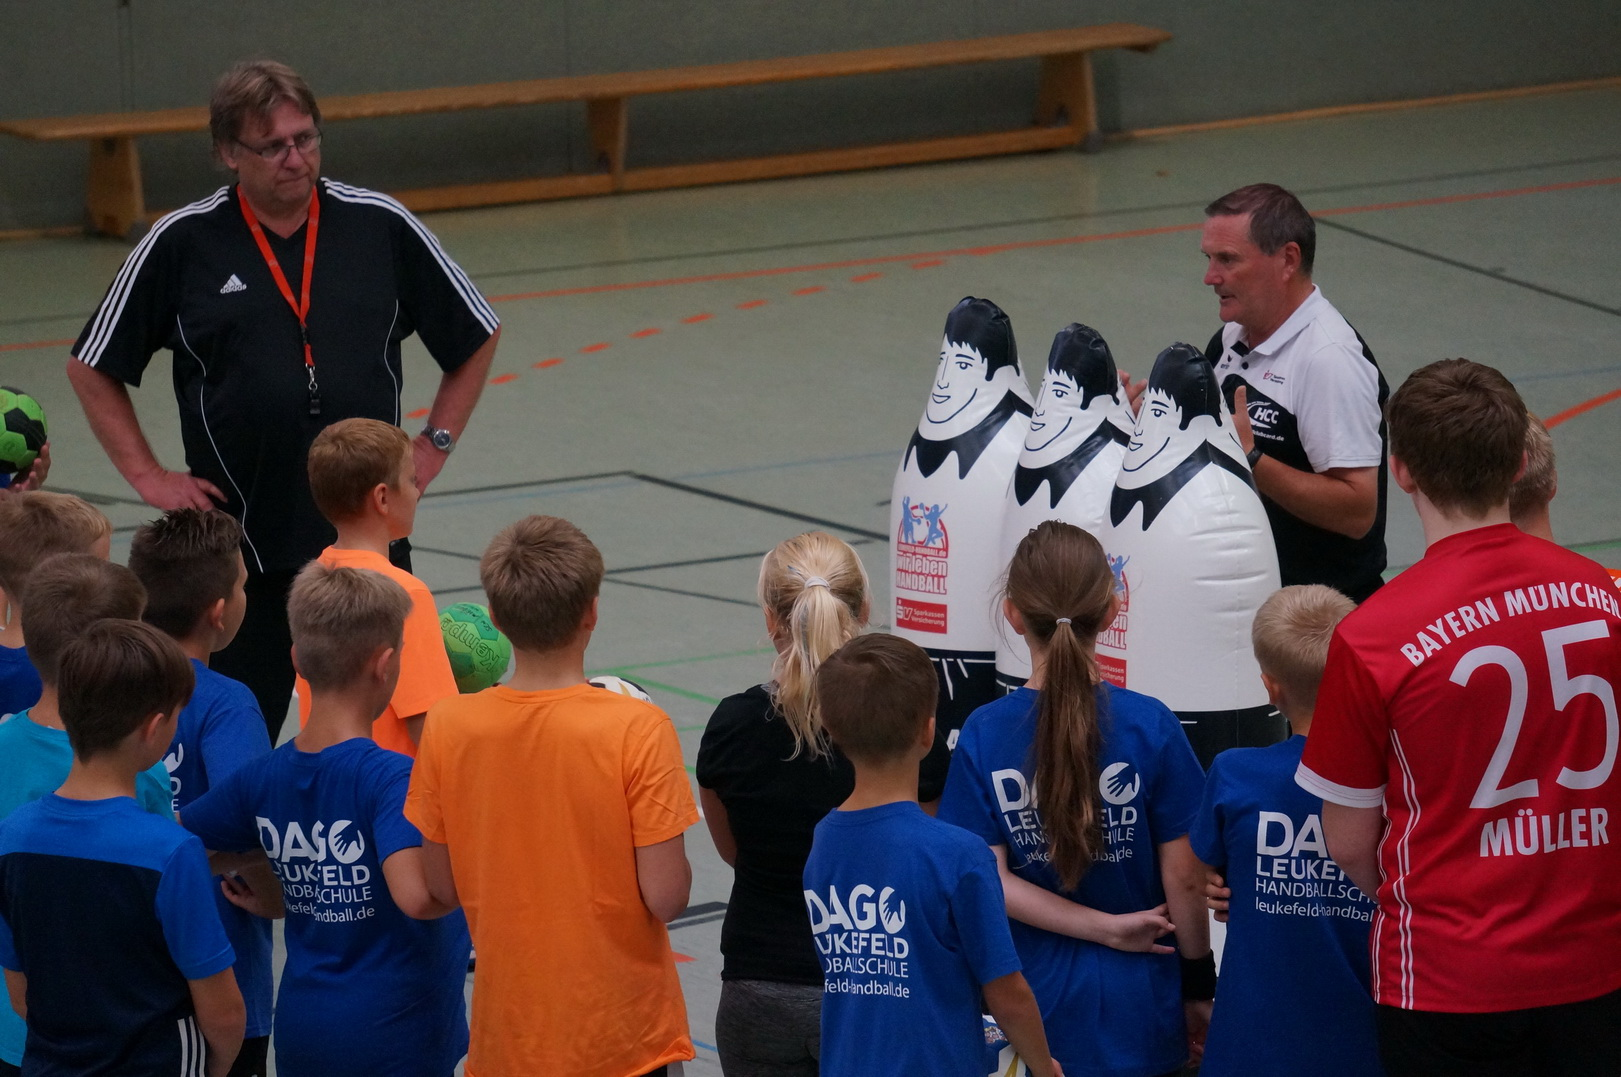 201808_Handballcamp_SDH_MG_250w